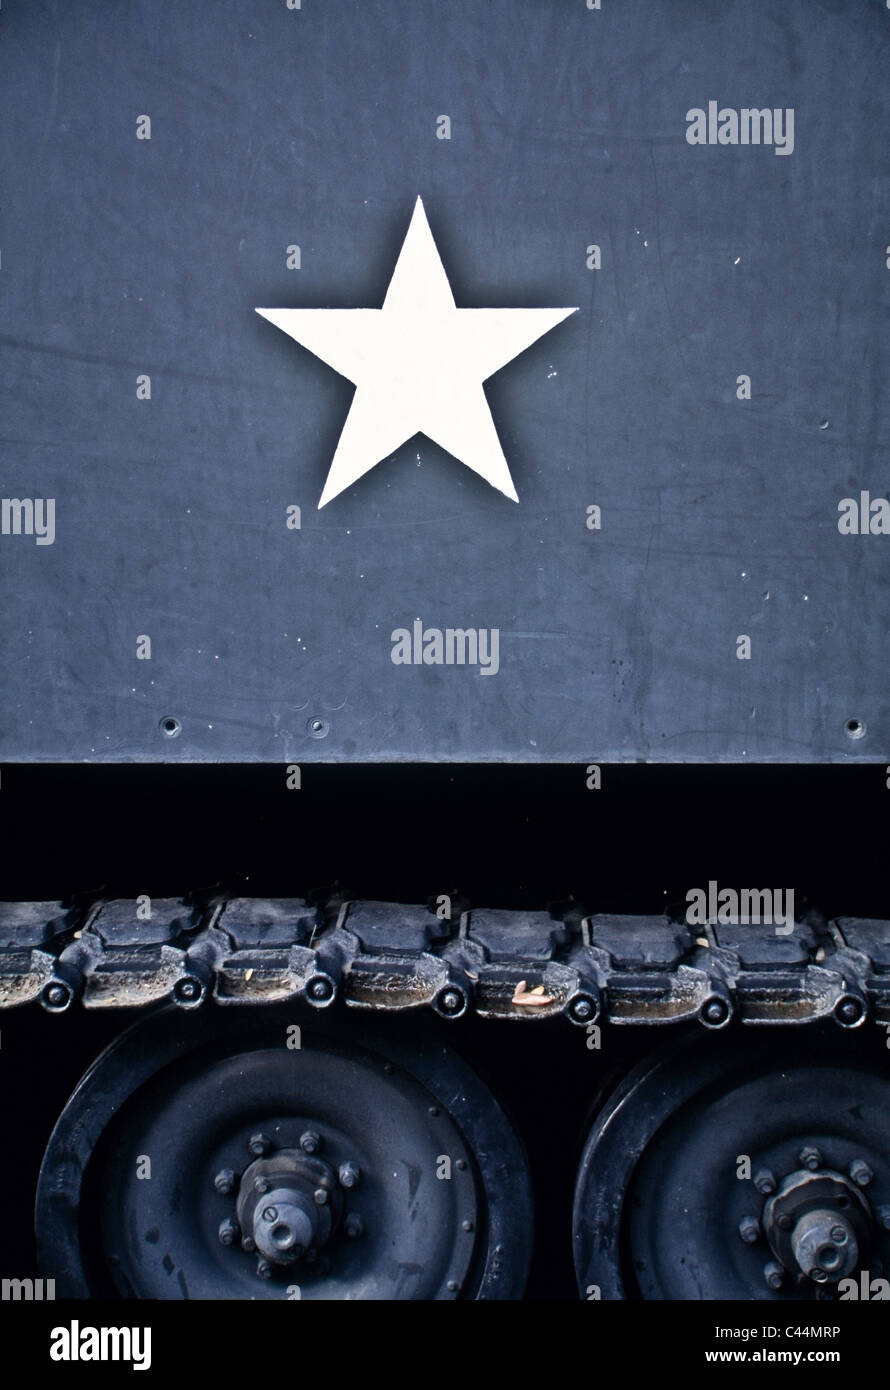 War Remnants Museum, Ho Chi Minh City, Vietnam - Stock Image